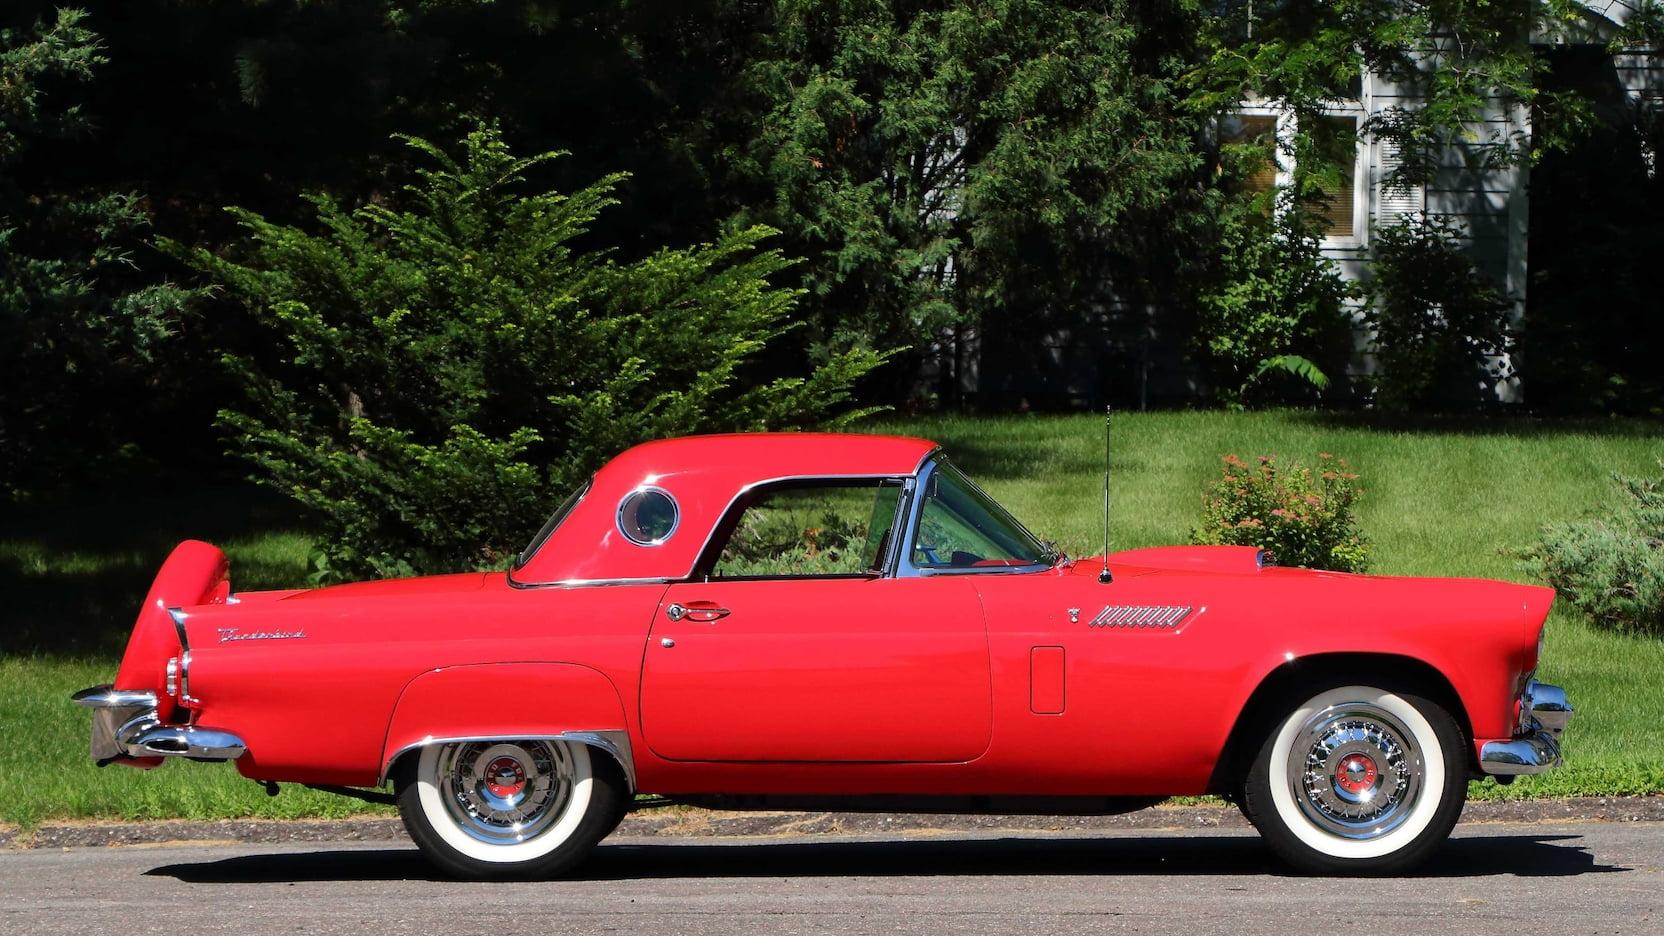 1956 Ford Thunderbird profile